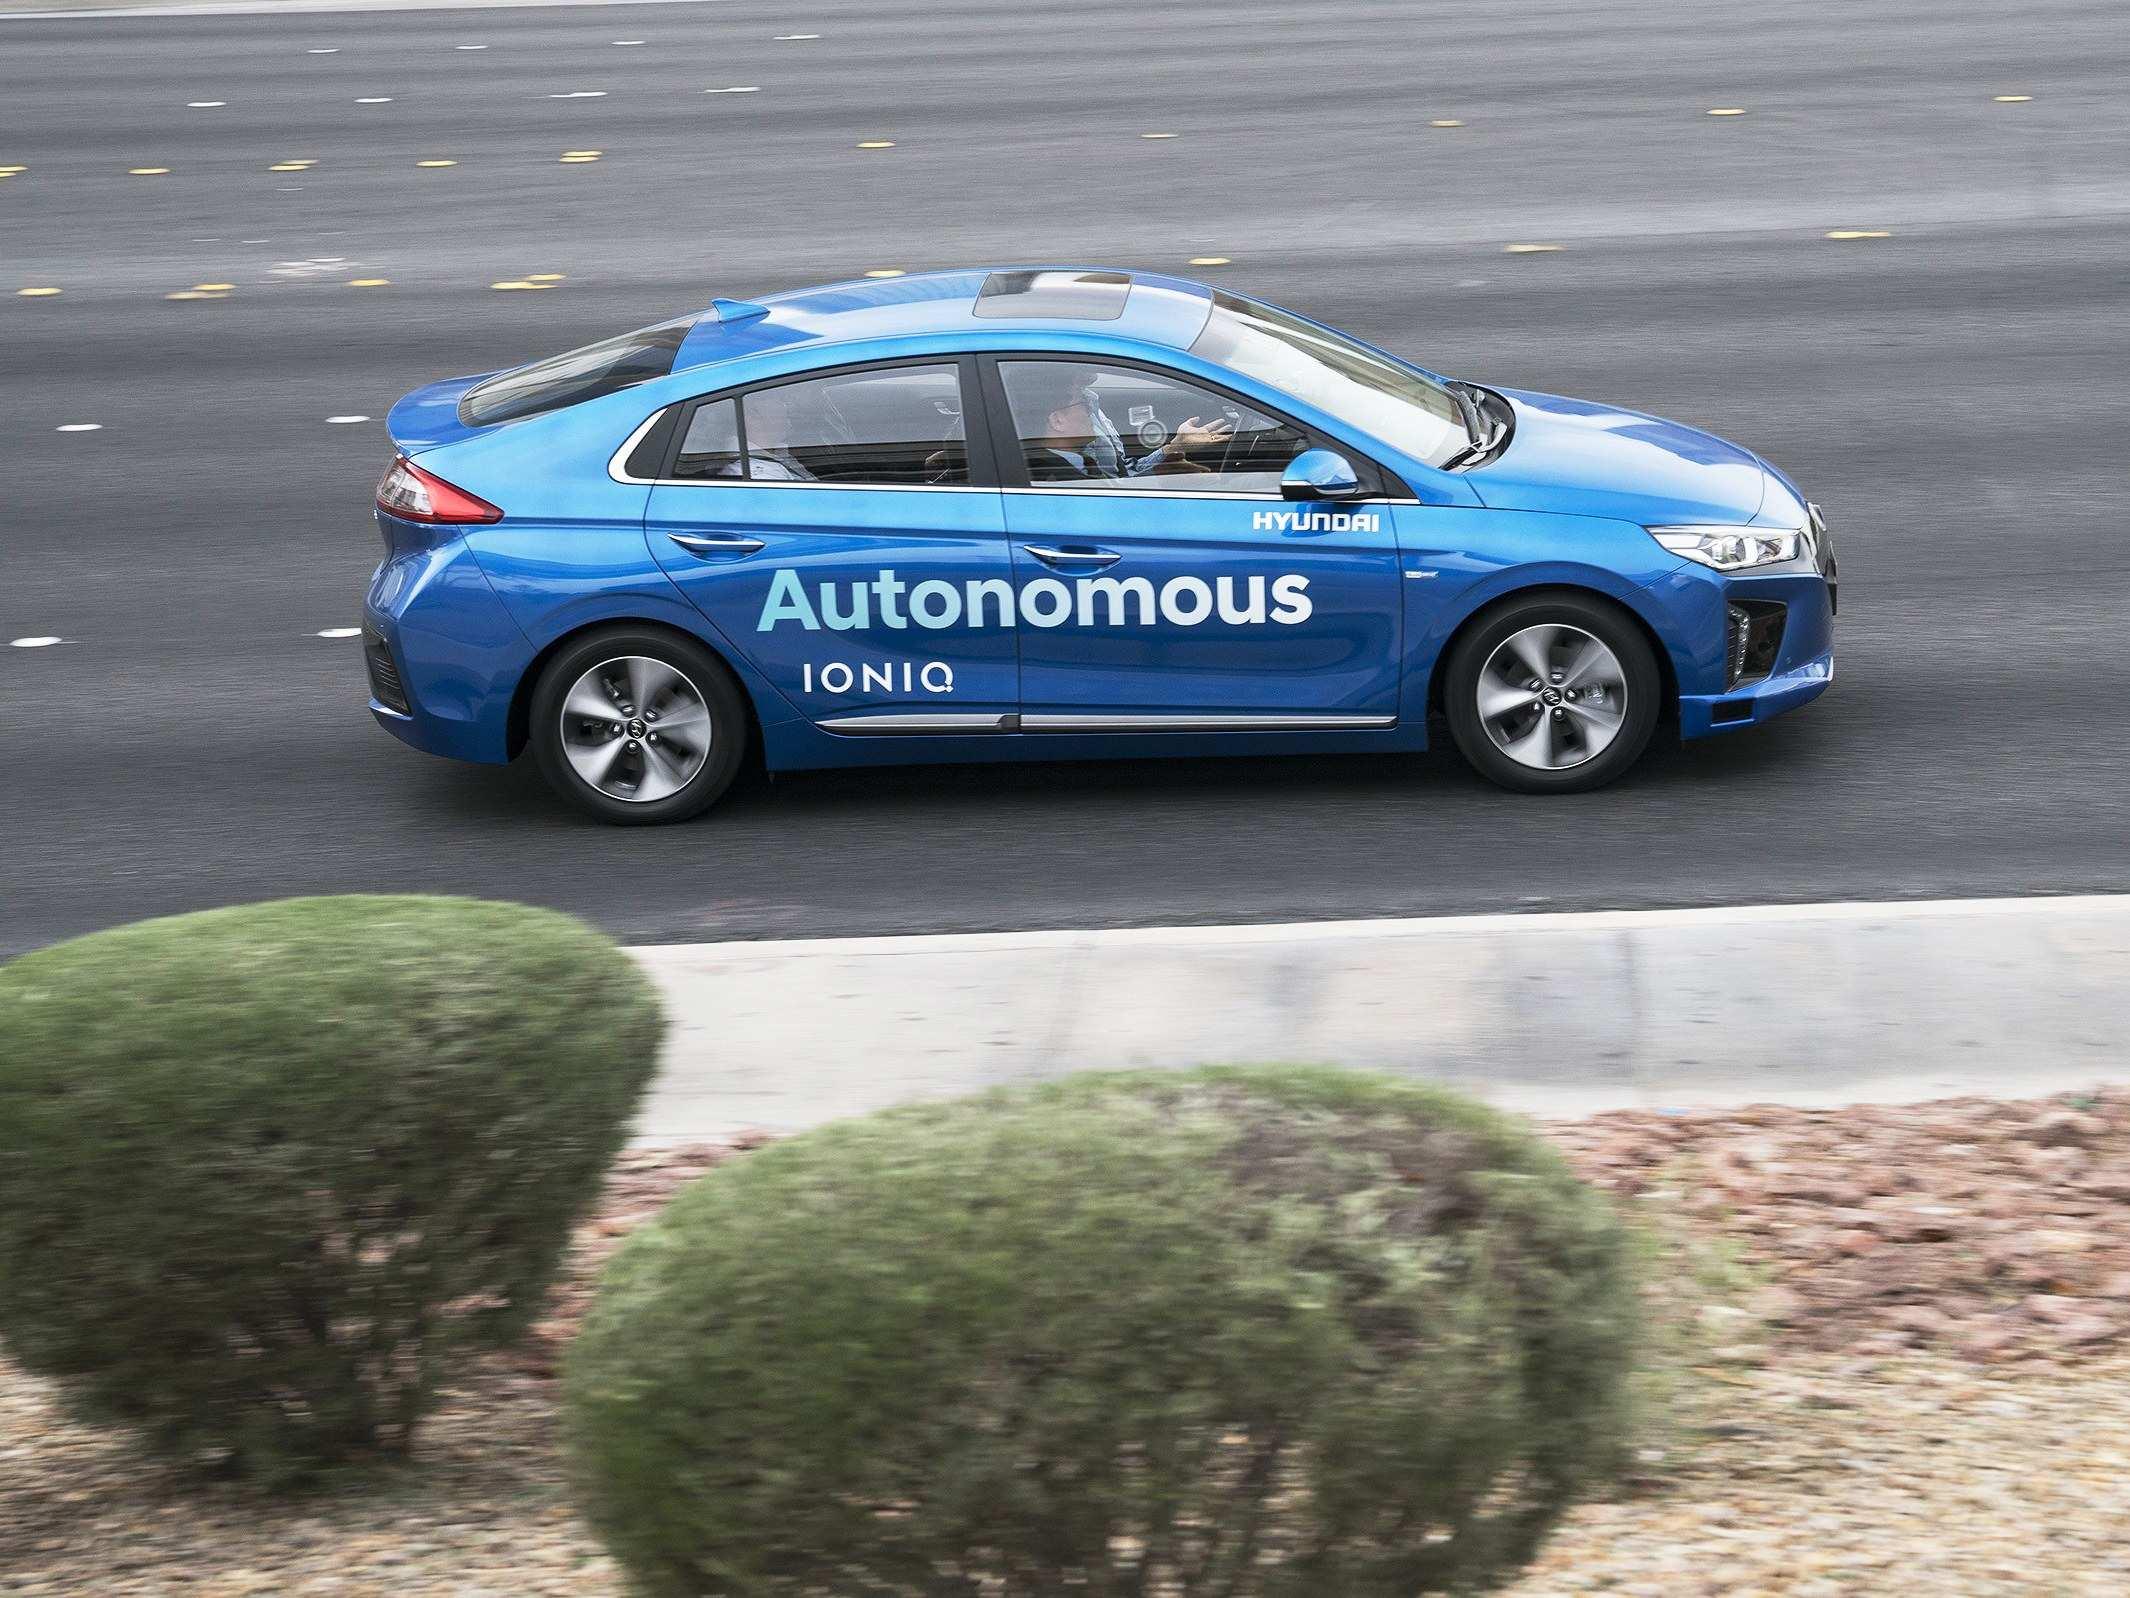 52 Great Hyundai Autonomous 2020 Specs with Hyundai Autonomous 2020